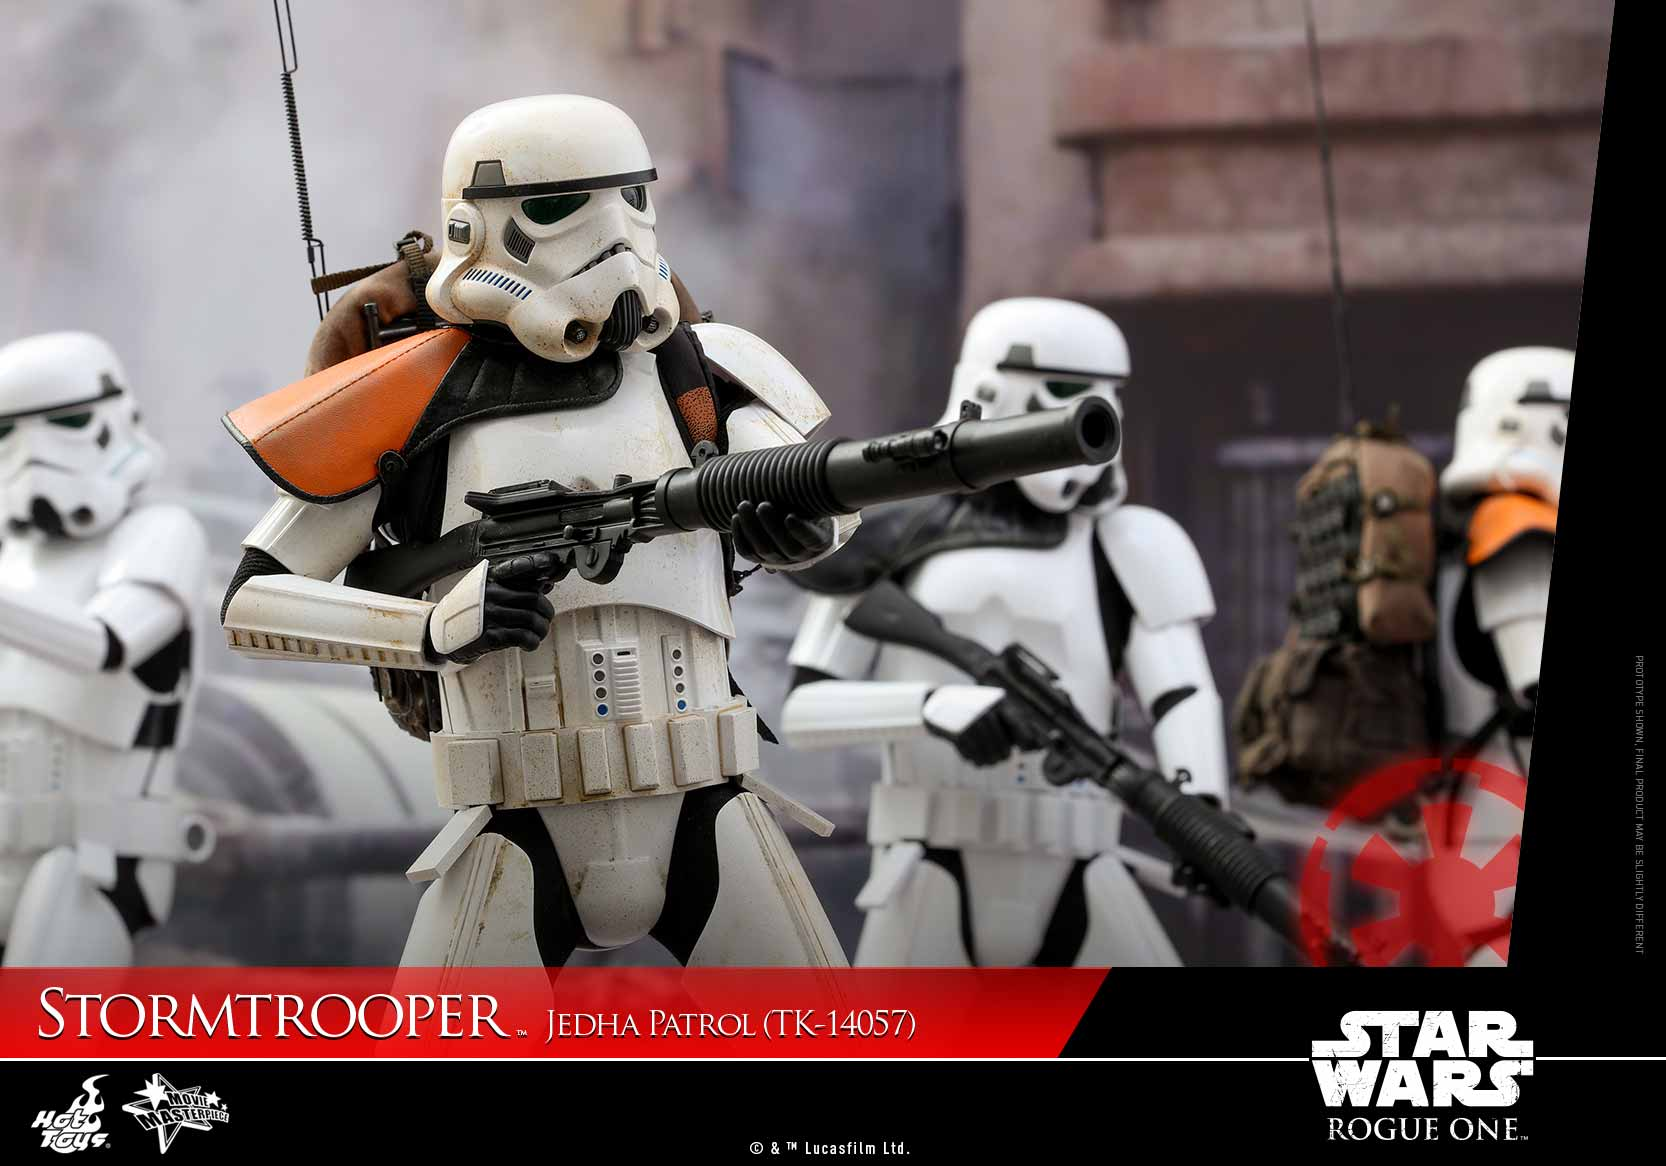 hot-toys-swro-stormtrooper-jedha-patrol-tk-14057-collectible-figure_pr5